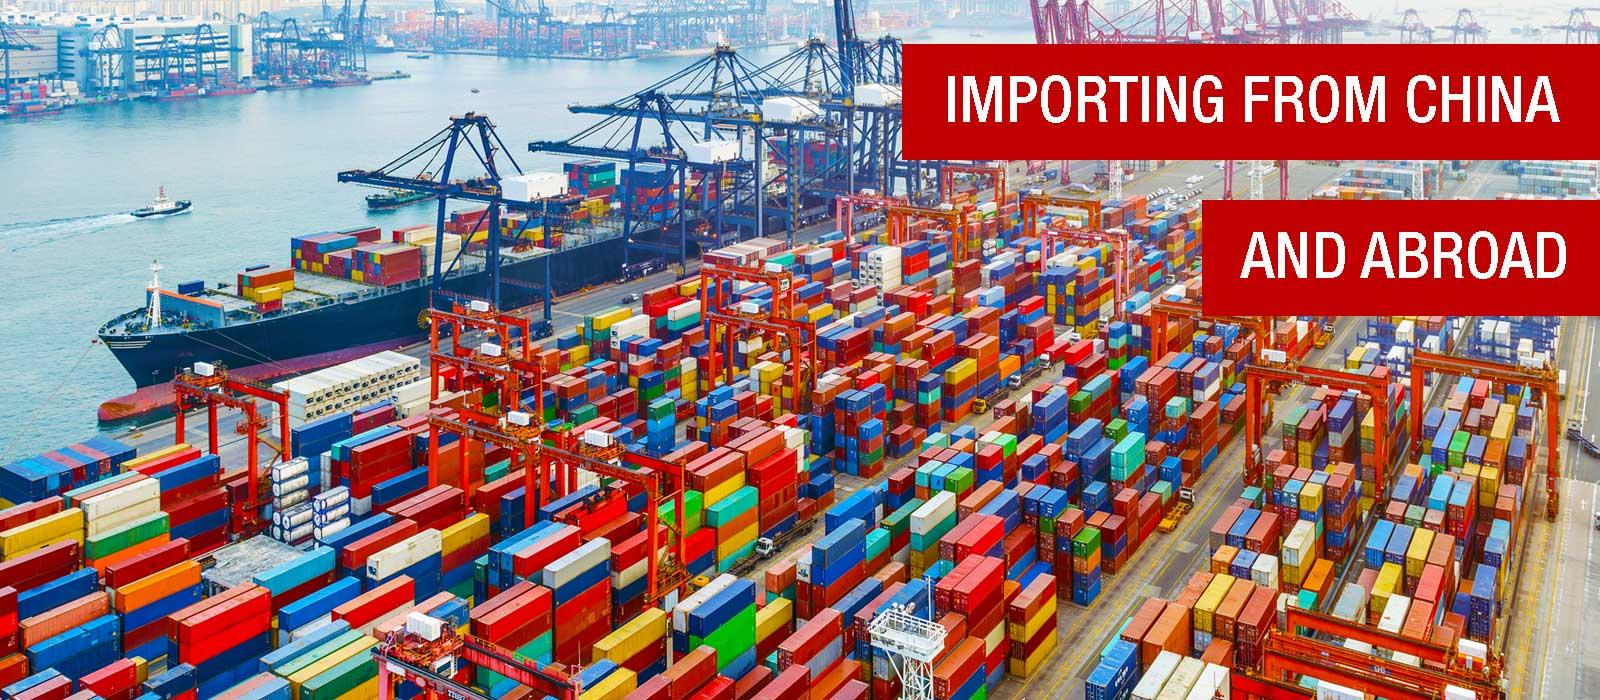 retail-import-slider-med.jpg